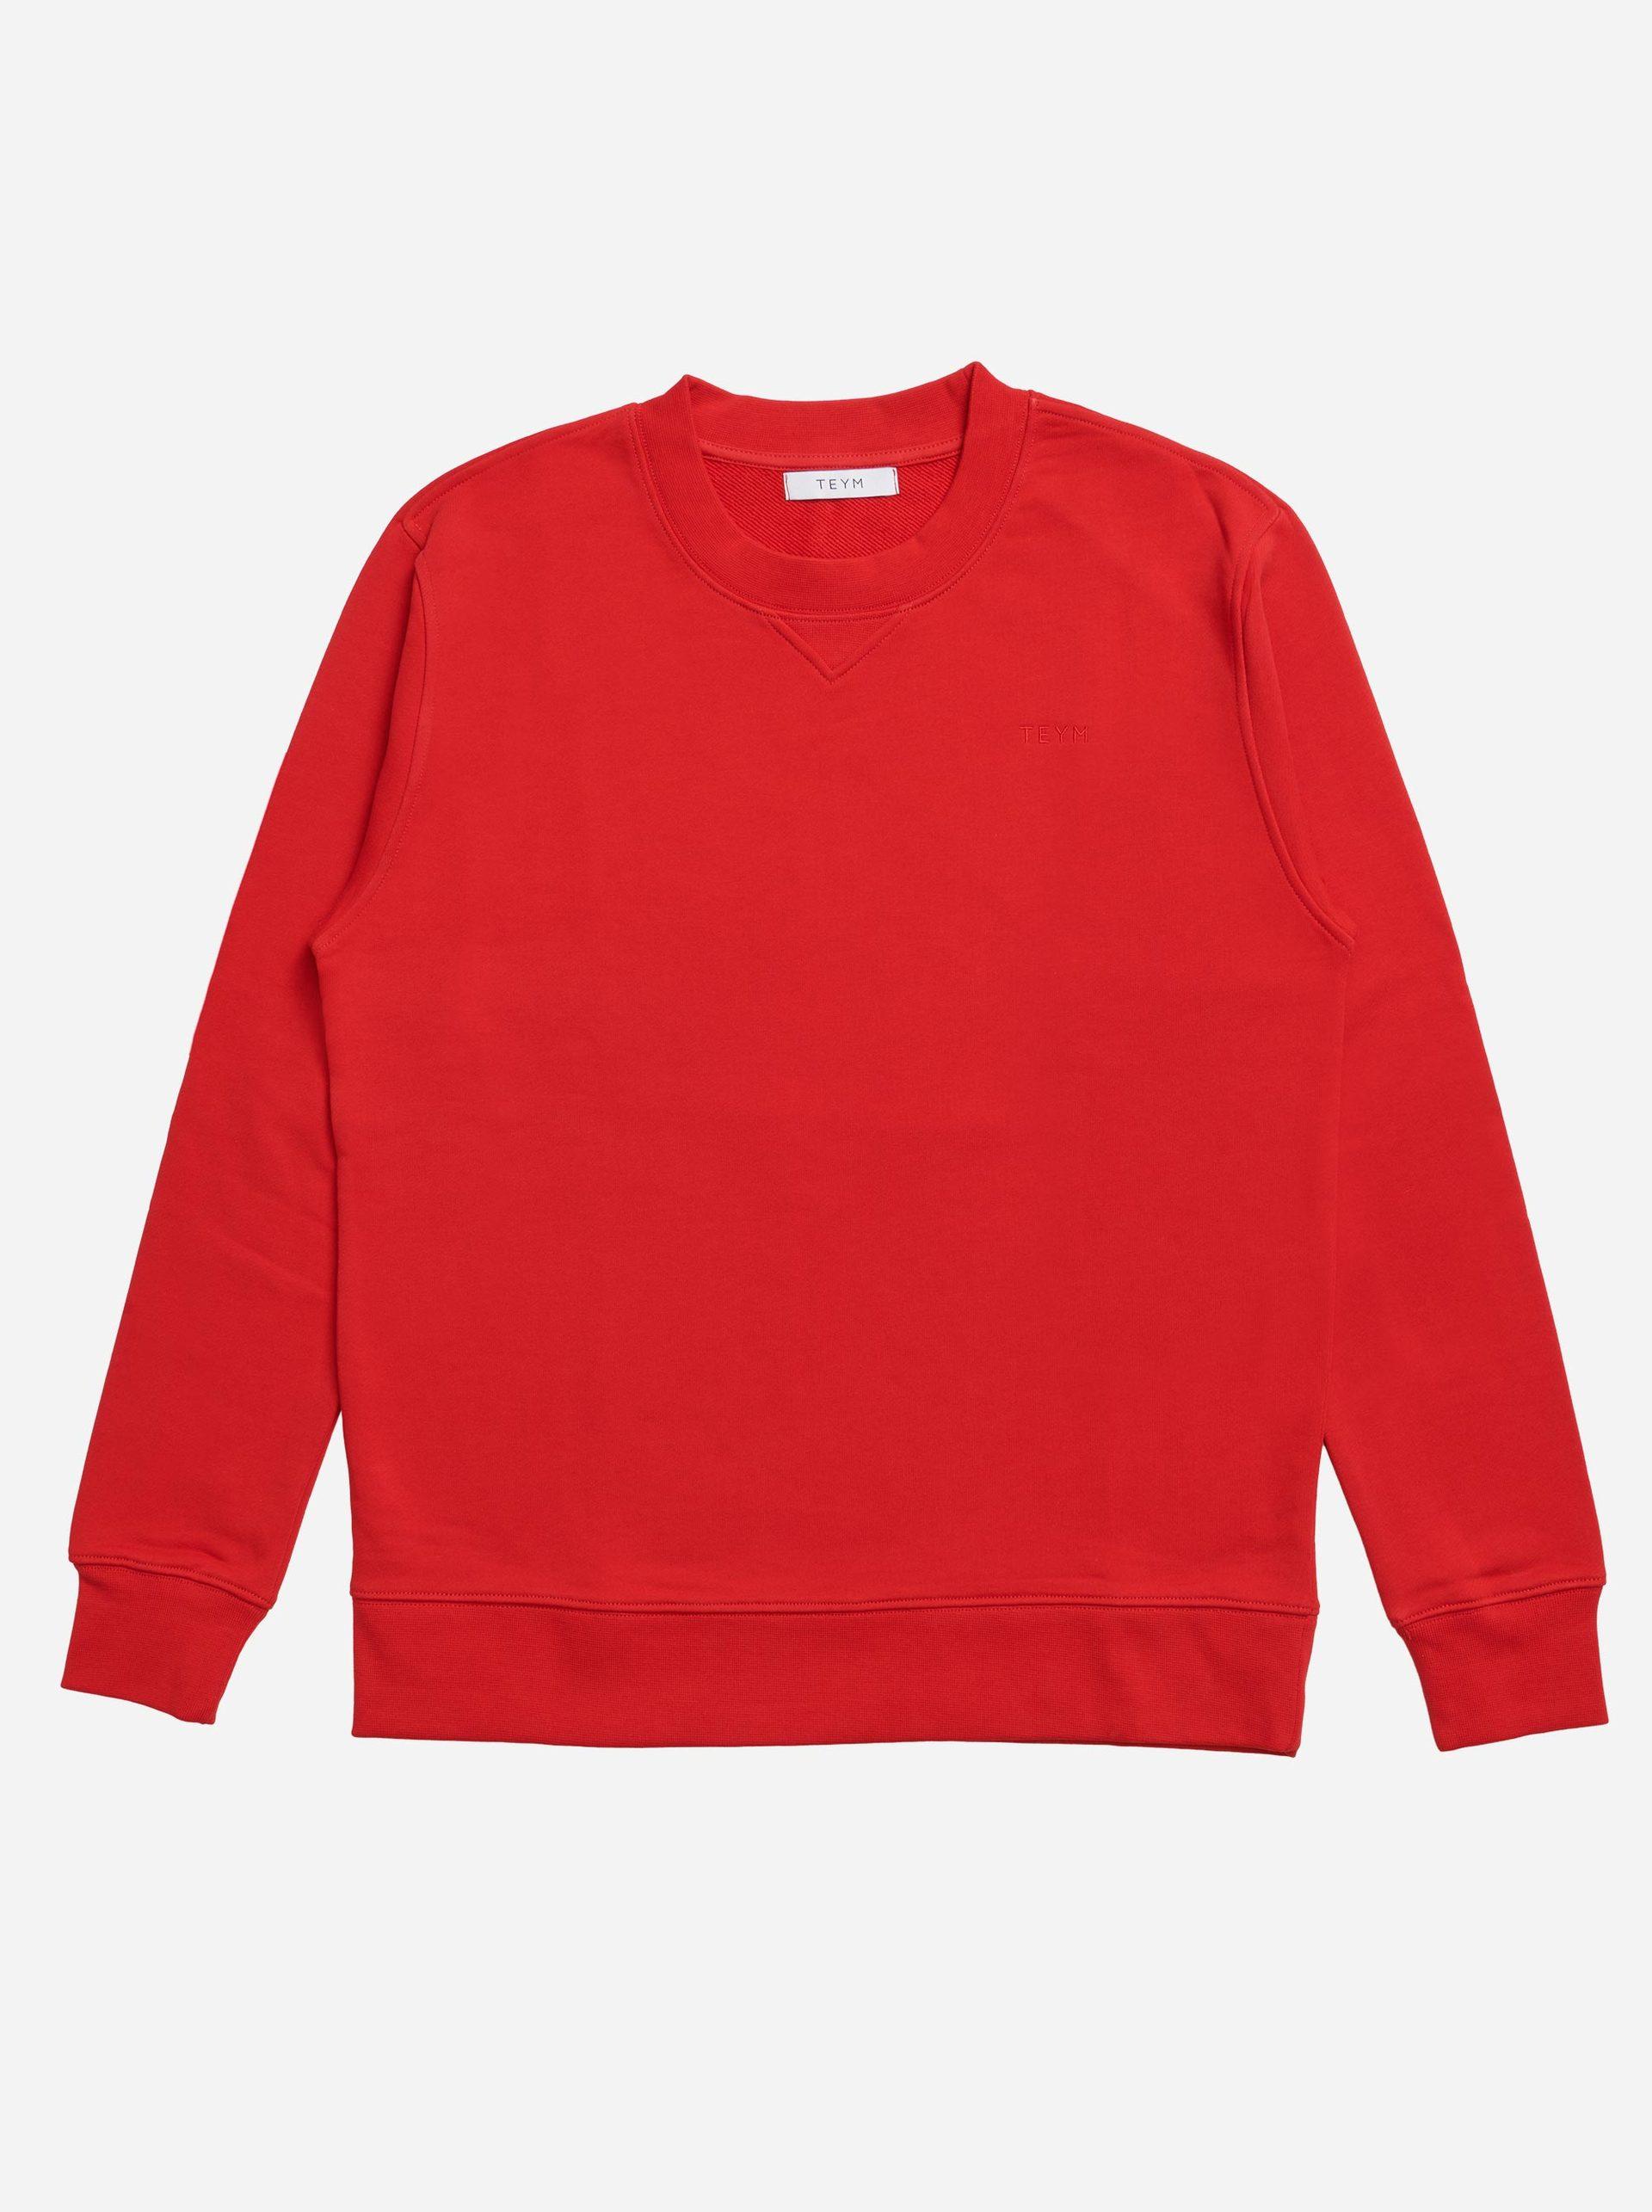 Teym-TheSweatshirt-Men-Red04